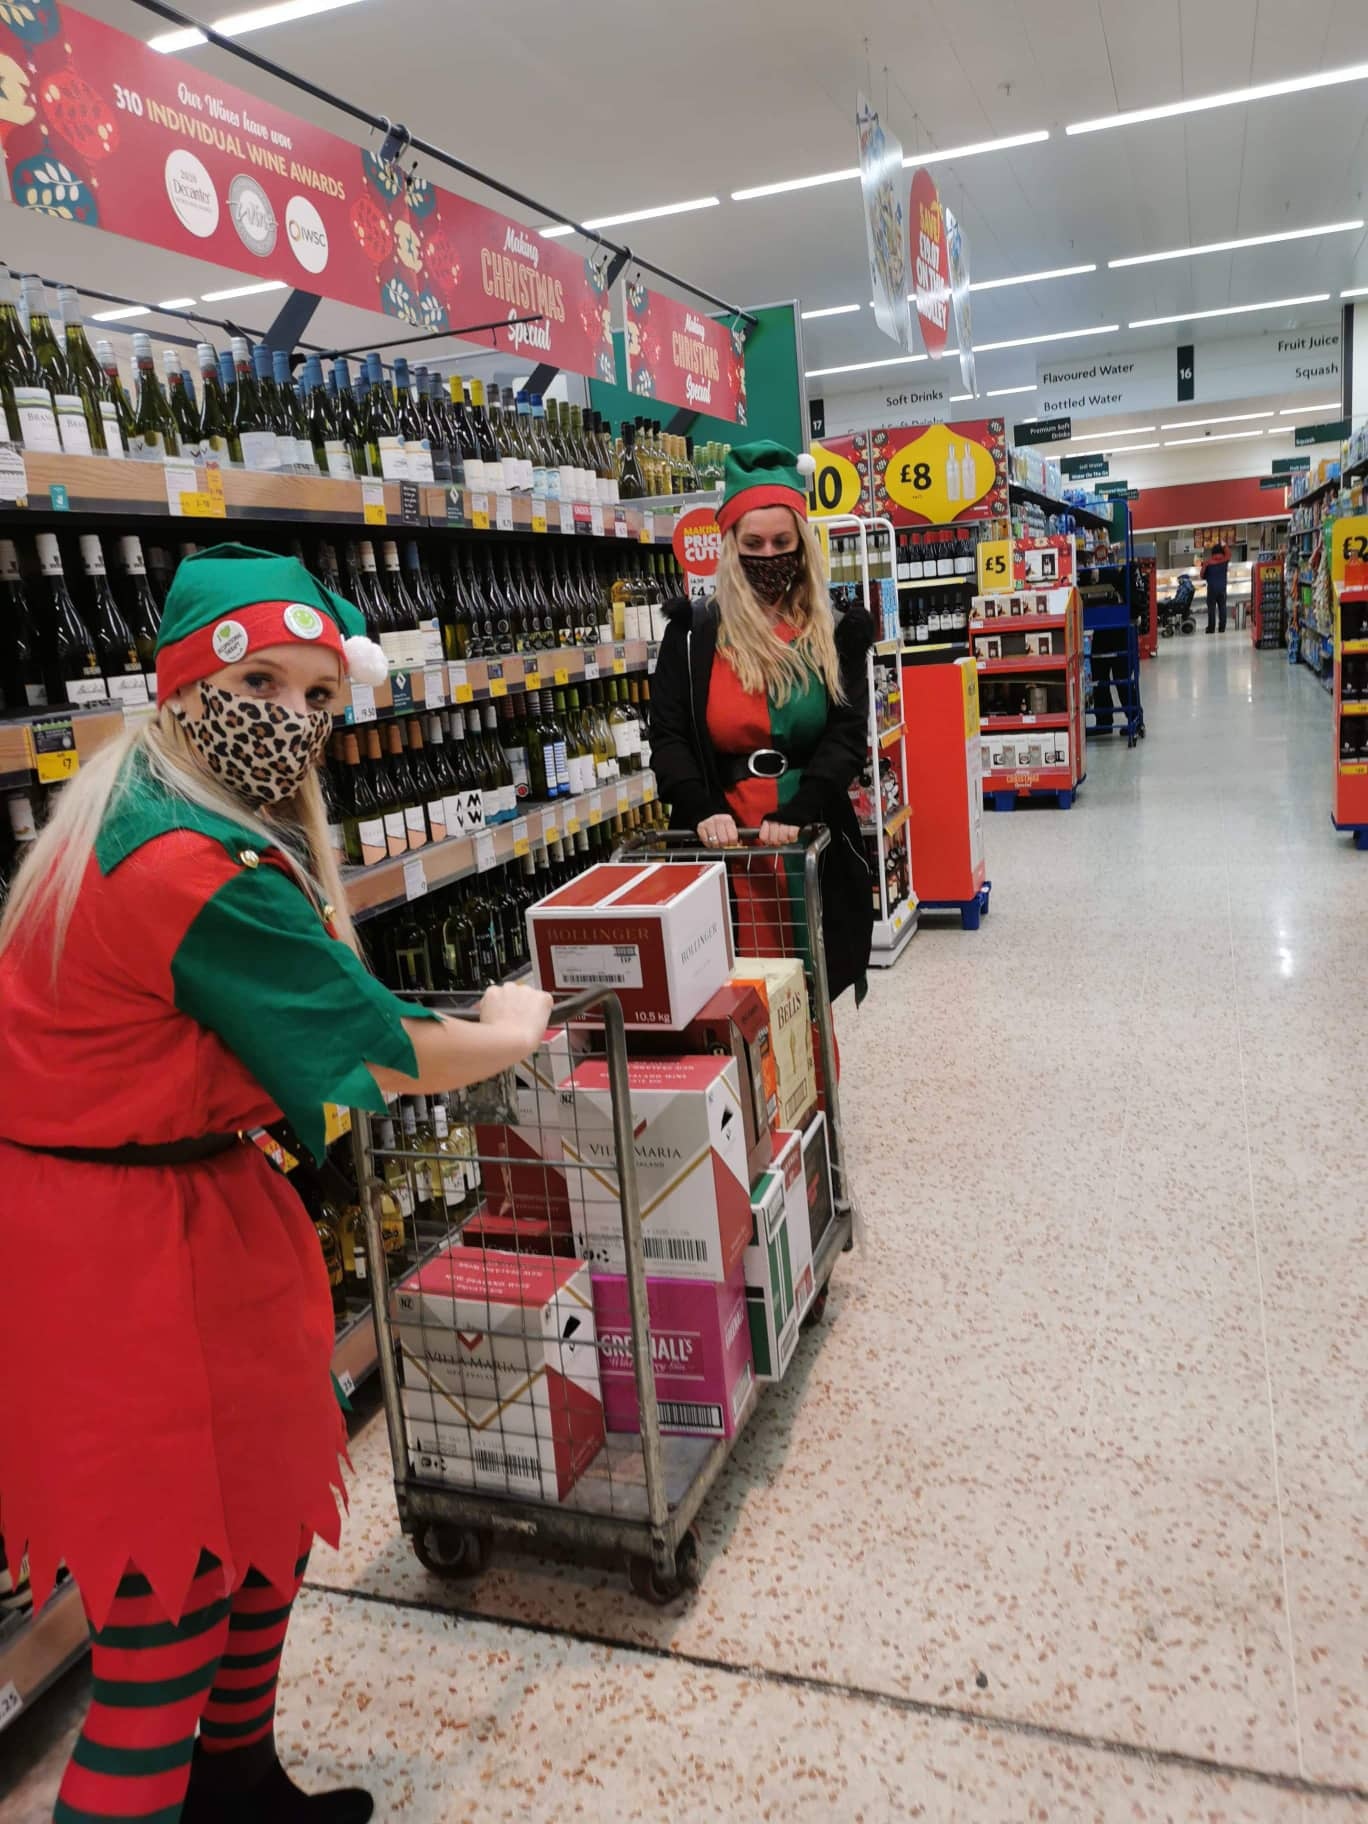 Ladies wearing elf costumes filling trolley with wine bottles